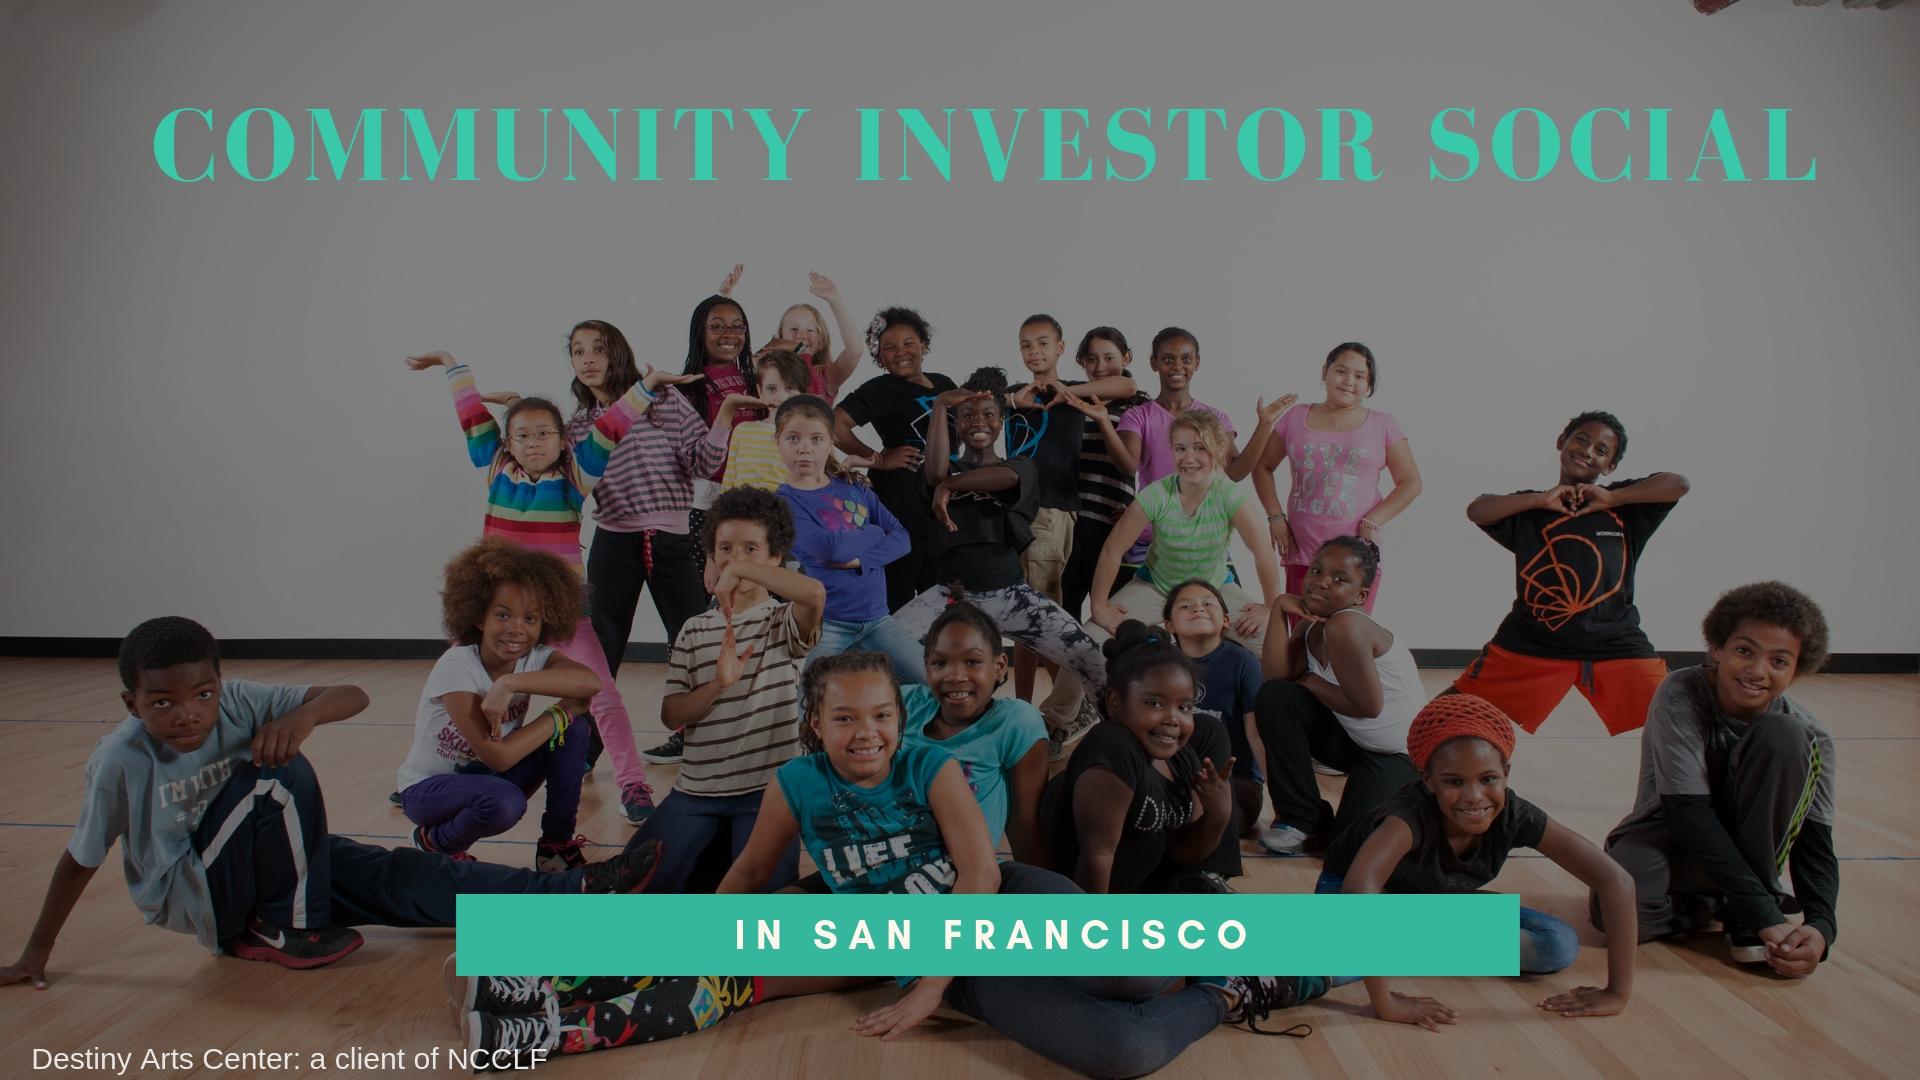 Community Investor Social in San Francisco